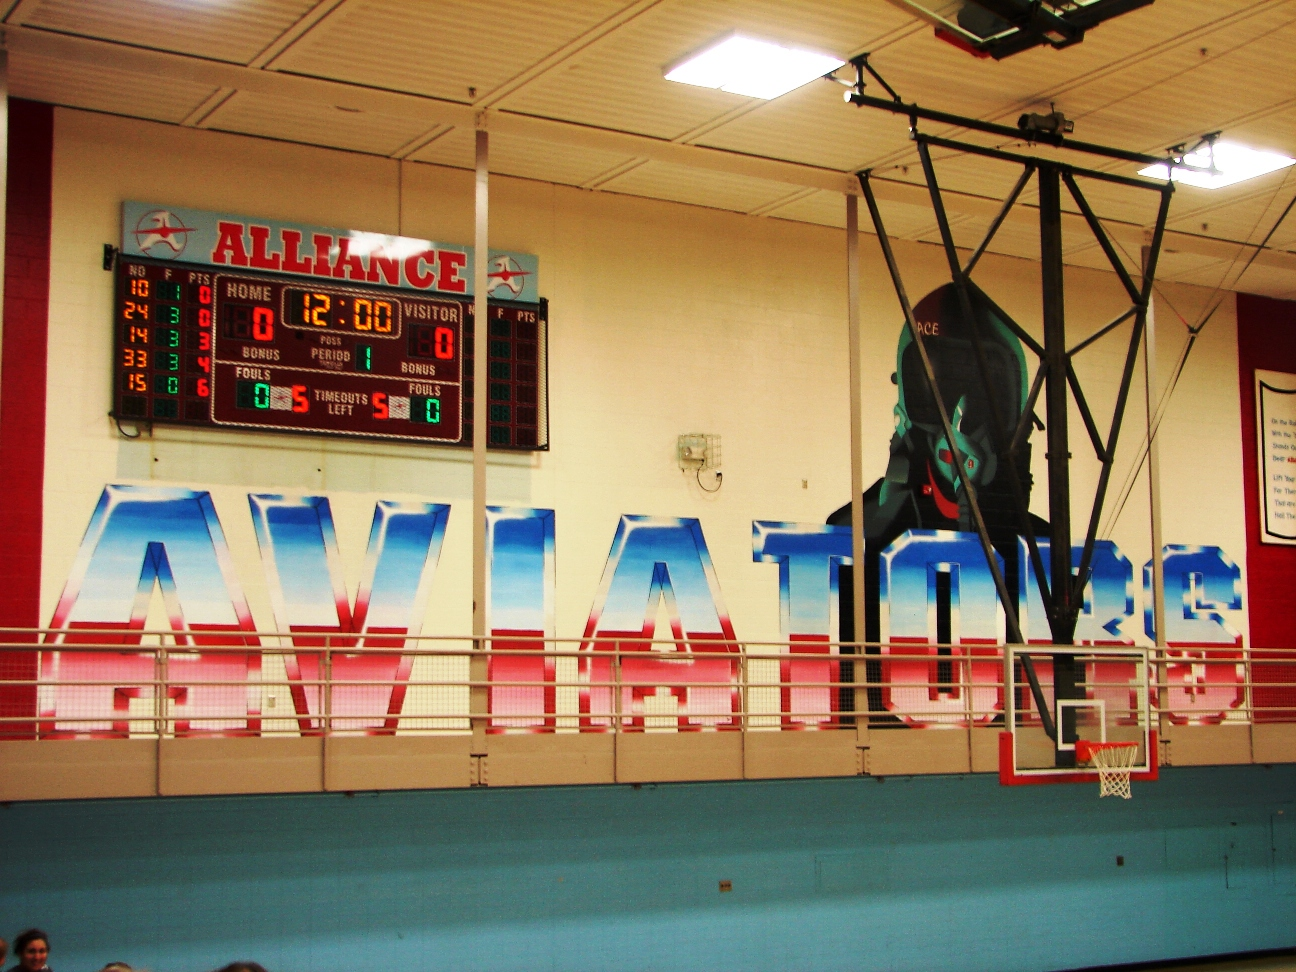 Alliance Aviators Harry Fails Gymnasium Painting and Scoreboard